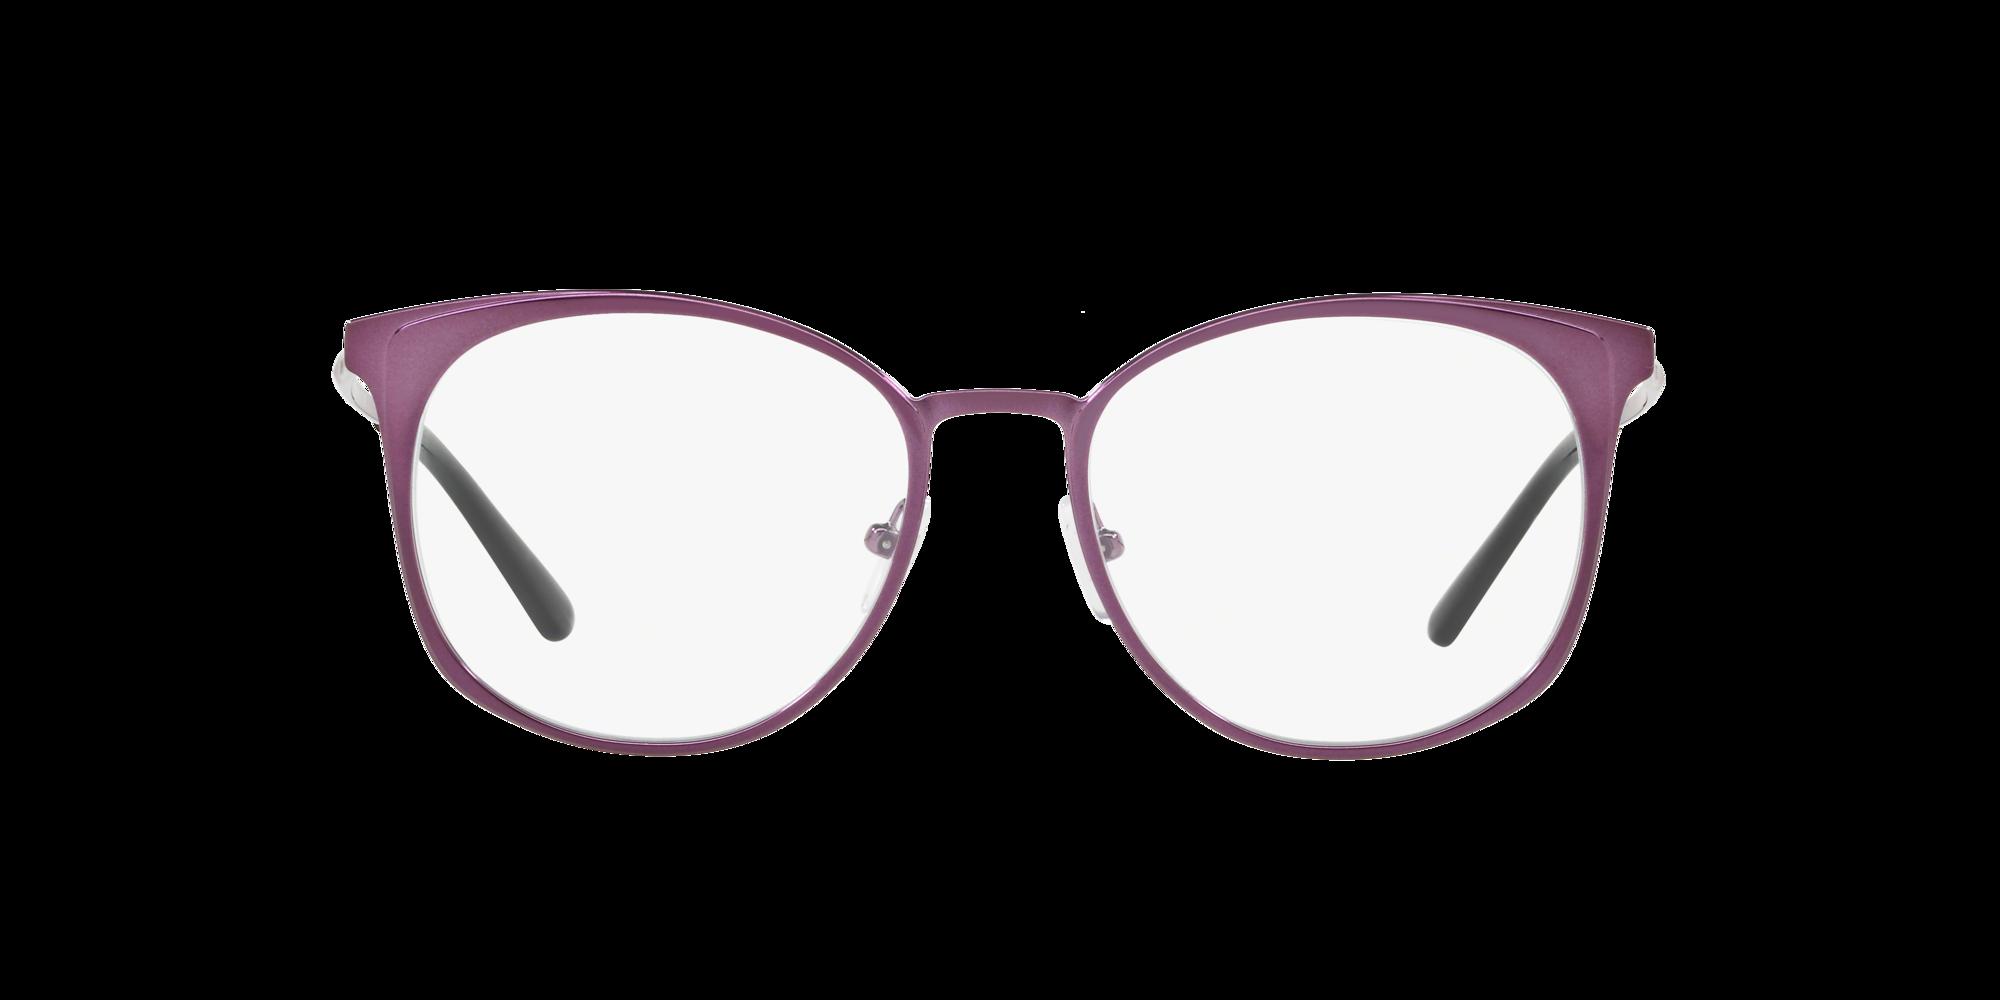 Image for MK3022 NEW ORLEANS from LensCrafters | Glasses, Prescription Glasses Online, Eyewear